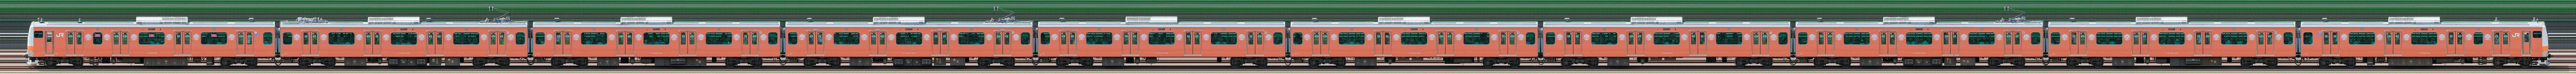 JR東日本 中央快速線 E233系T24編成(中央線開業130周年記念ラッピングトレイン・山側)の編成サイドビュー